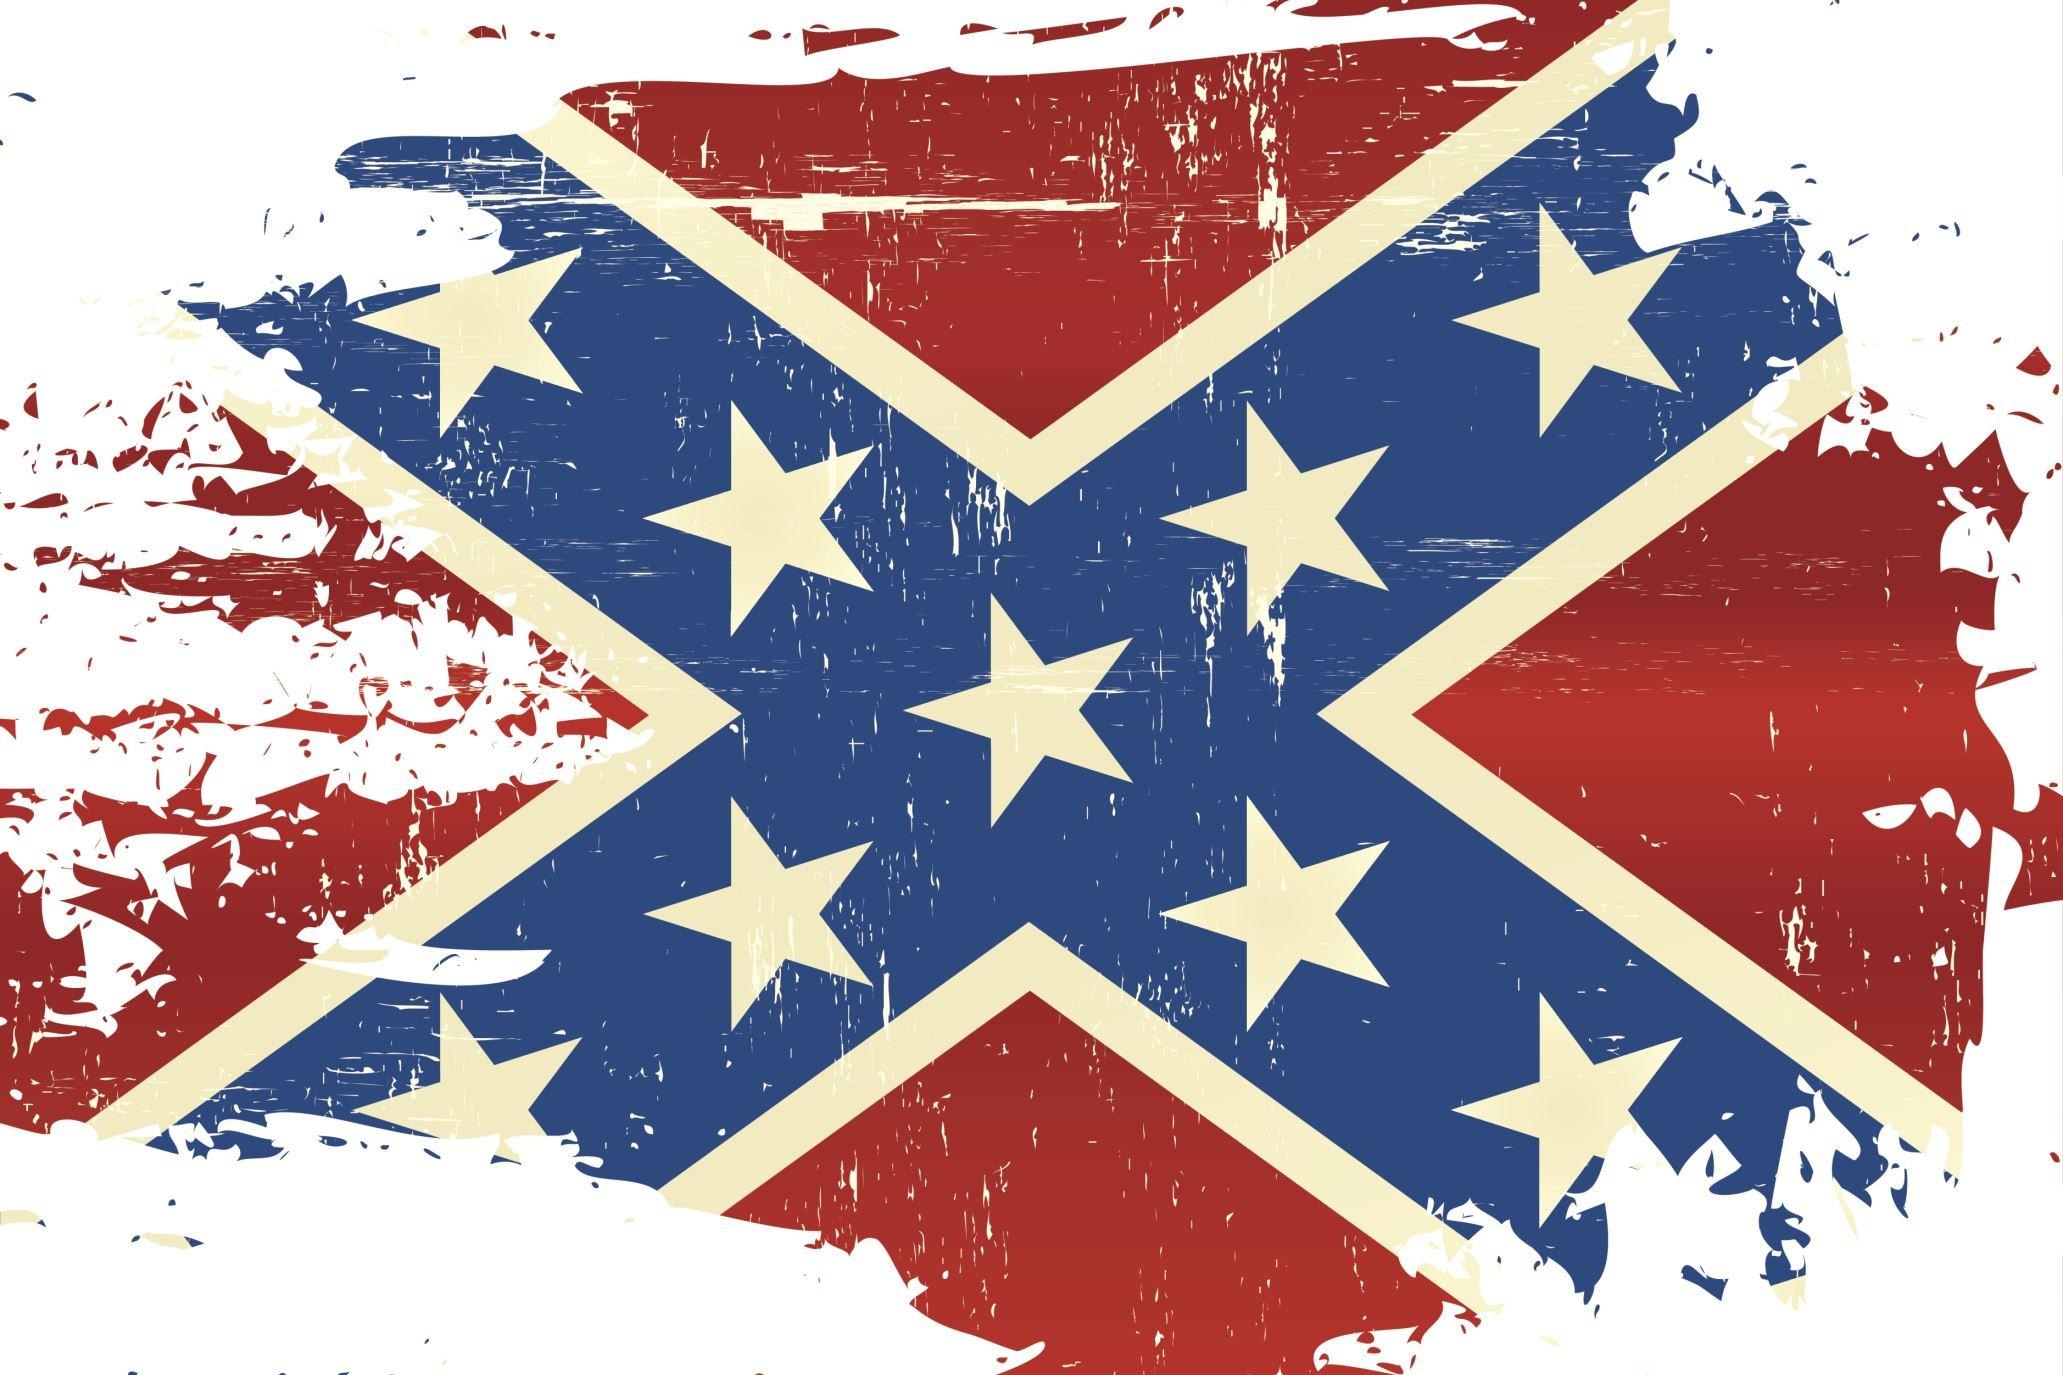 CONFEDERATE flag usa america united states csa civil war rebel dixie military poster wallpaper | 2063x1375 | 742429 | WallpaperUP